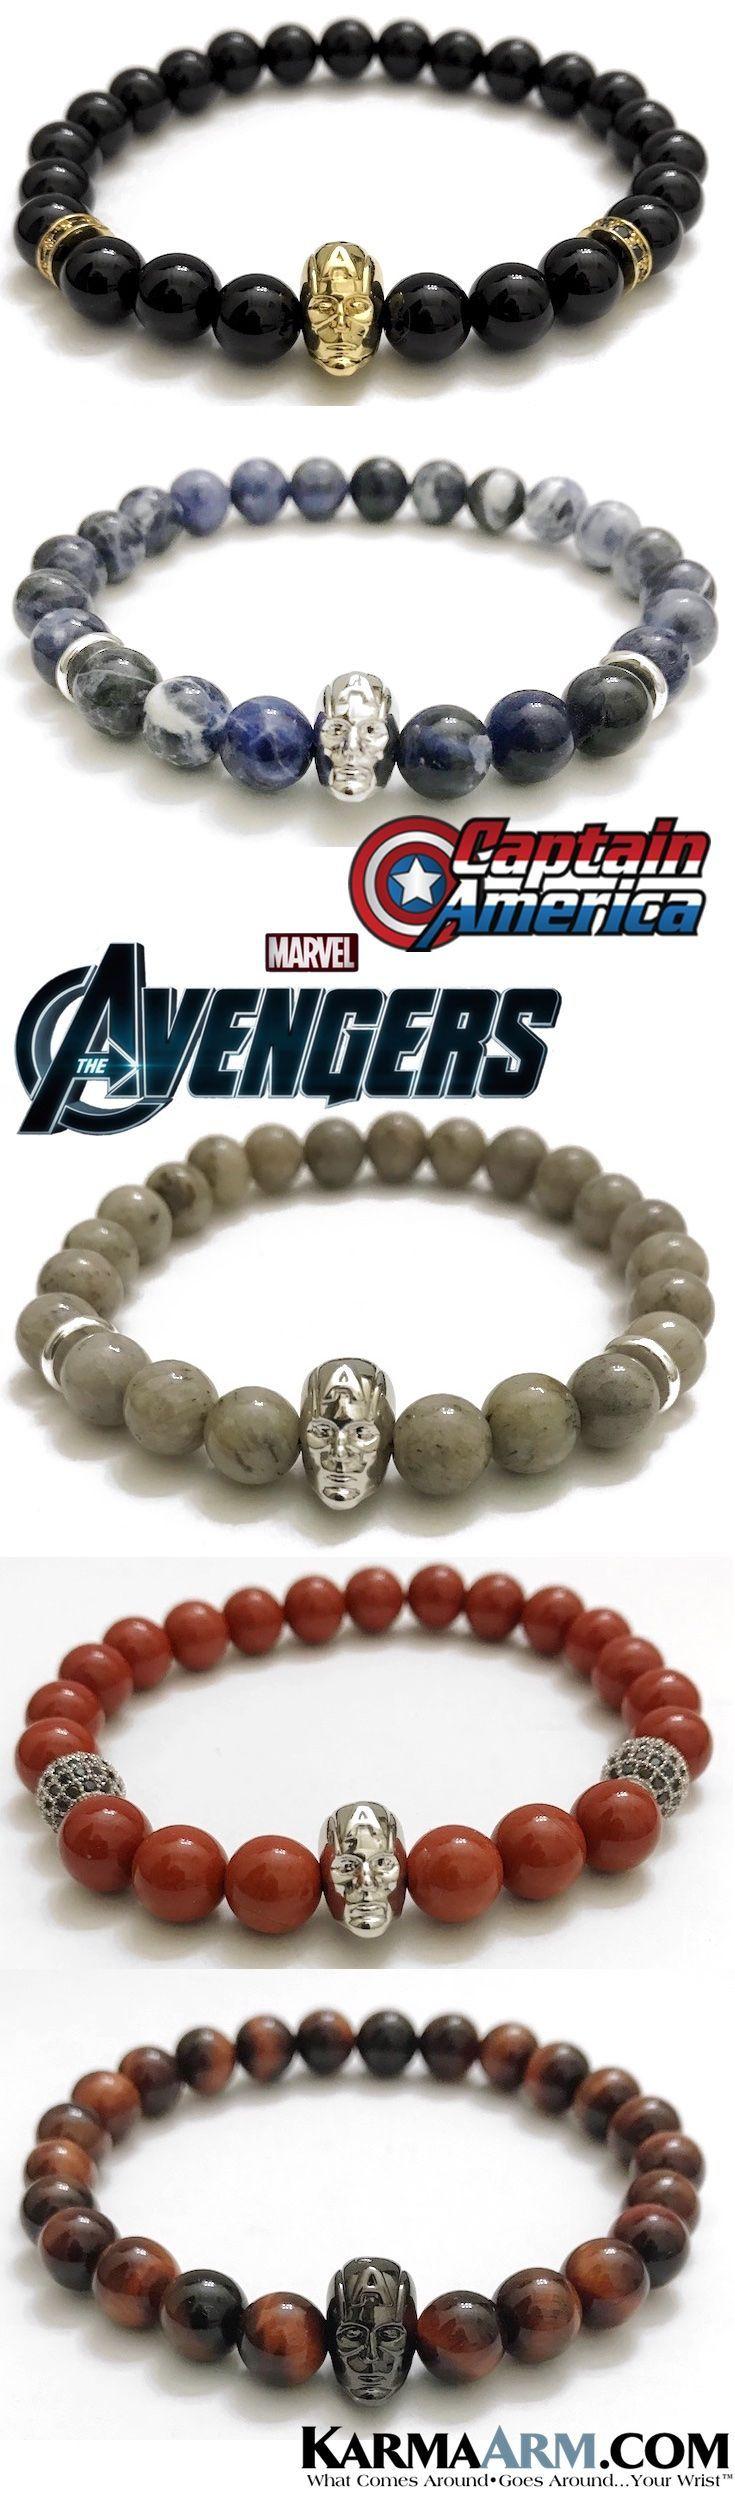 CAPTAIN AMERICA Bracelets | Marvel Comics Avengers - Steve Rogers - Iron Man Jewelry. Superhero CosPlay Bracelets & Gifts For Him. Natural Gemstone | Reiki Healing Luxury Jewelry for men. #Avengers #AvengersInfinity #Infinity #BlackPanther #T'Challa #Marvel #MarvelComics #IronMan  #TonyStark #CaptainAmerica #SteveRogers #Spiderman #PeterParker #Bracelets #Fanboy #Jewelry. #Comic-Con #Superhero #Comics #Mens